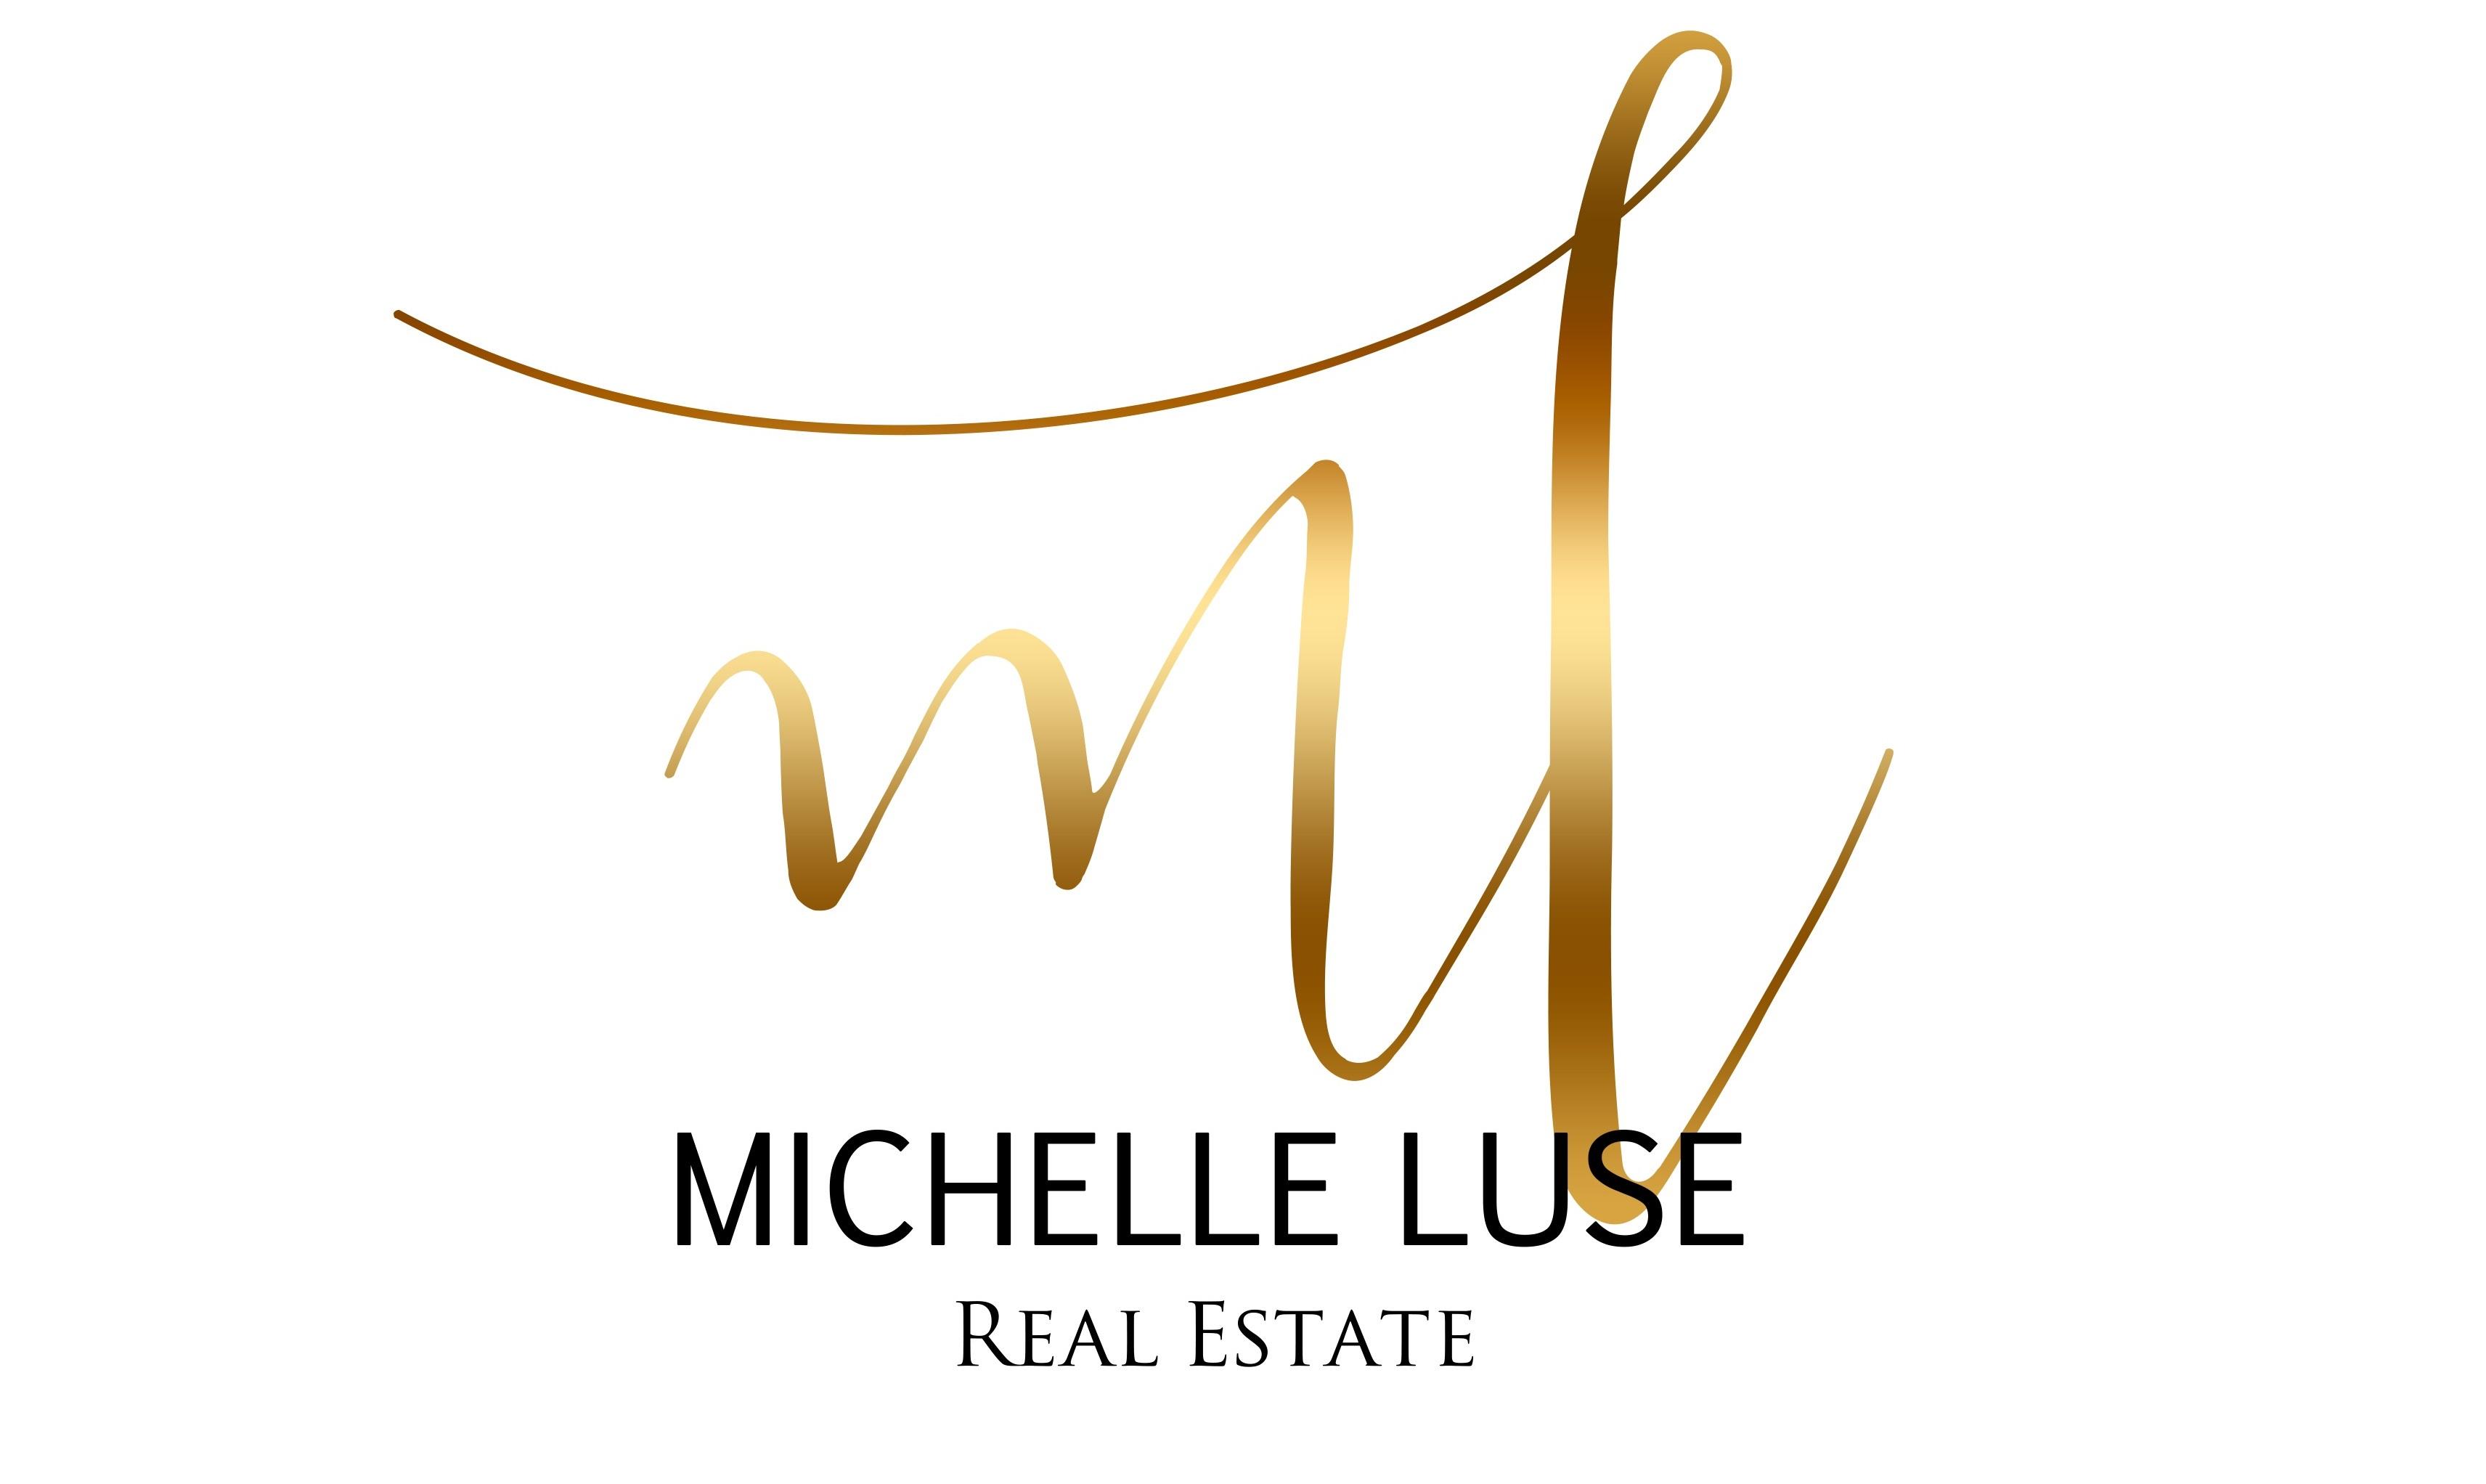 Michelle Luse Real Estate